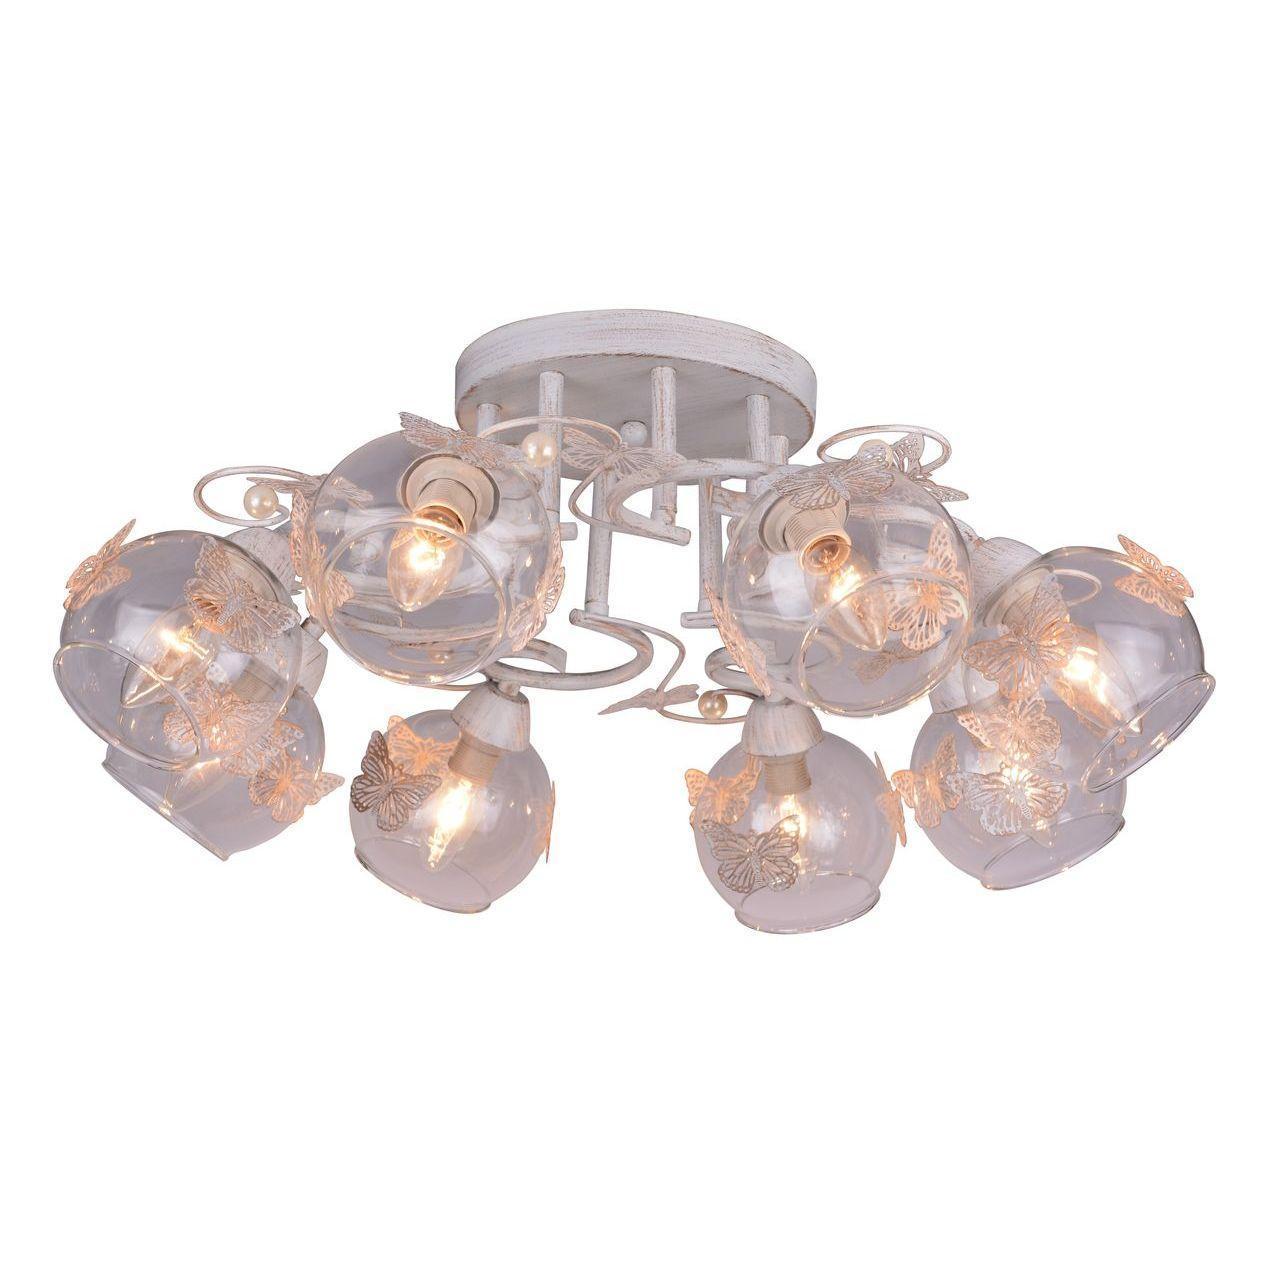 Люстра Arte Lamp Alessandra A5004PL-8WG потолочная arte lamp потолочная люстра arte lamp alessandra a5004pl 8ab